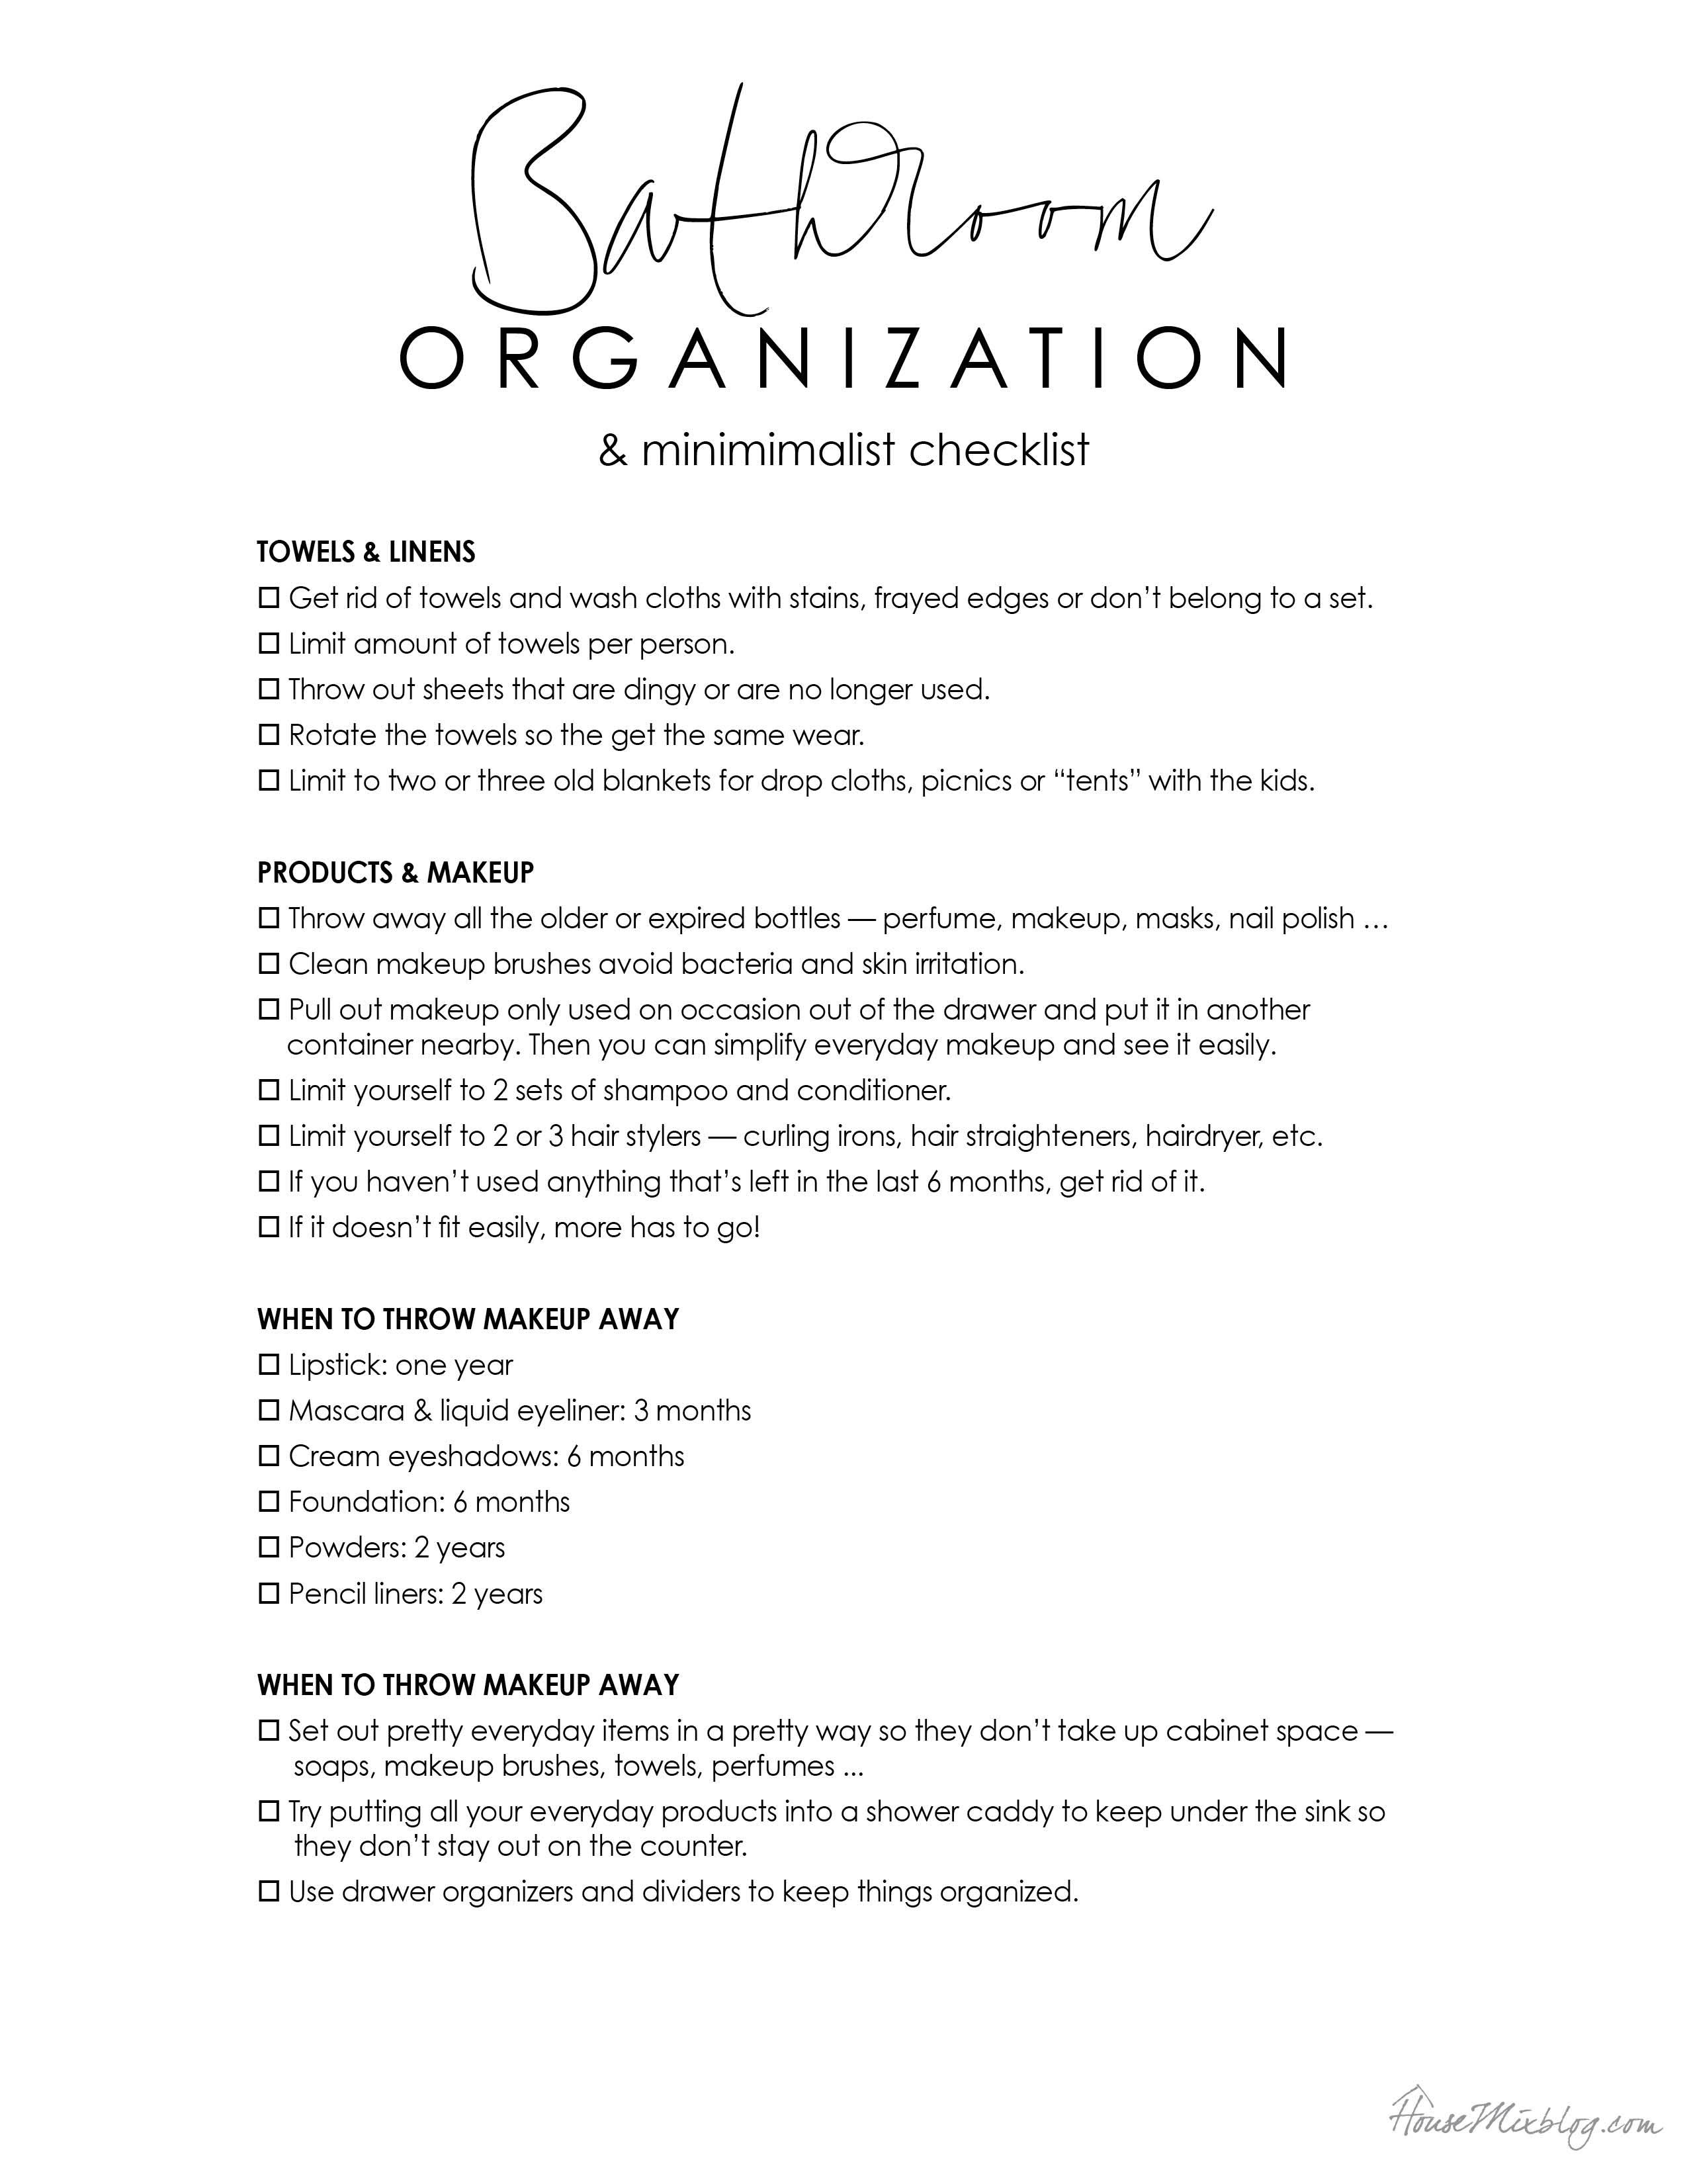 Bathroom organization and minimalist printable checklist